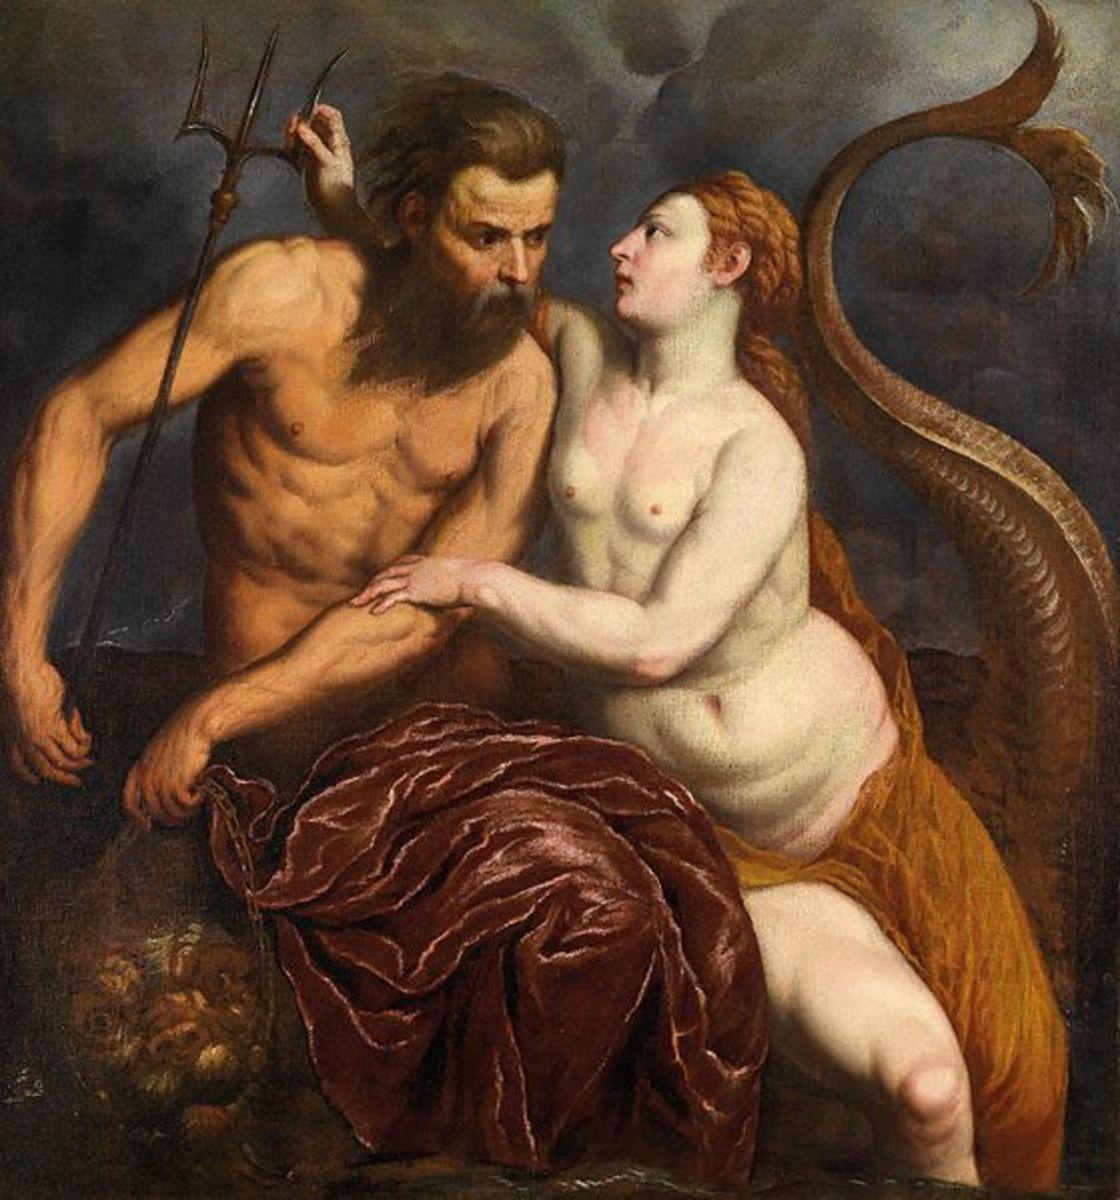 Paris Bordone (1500–1571) PD-art-100